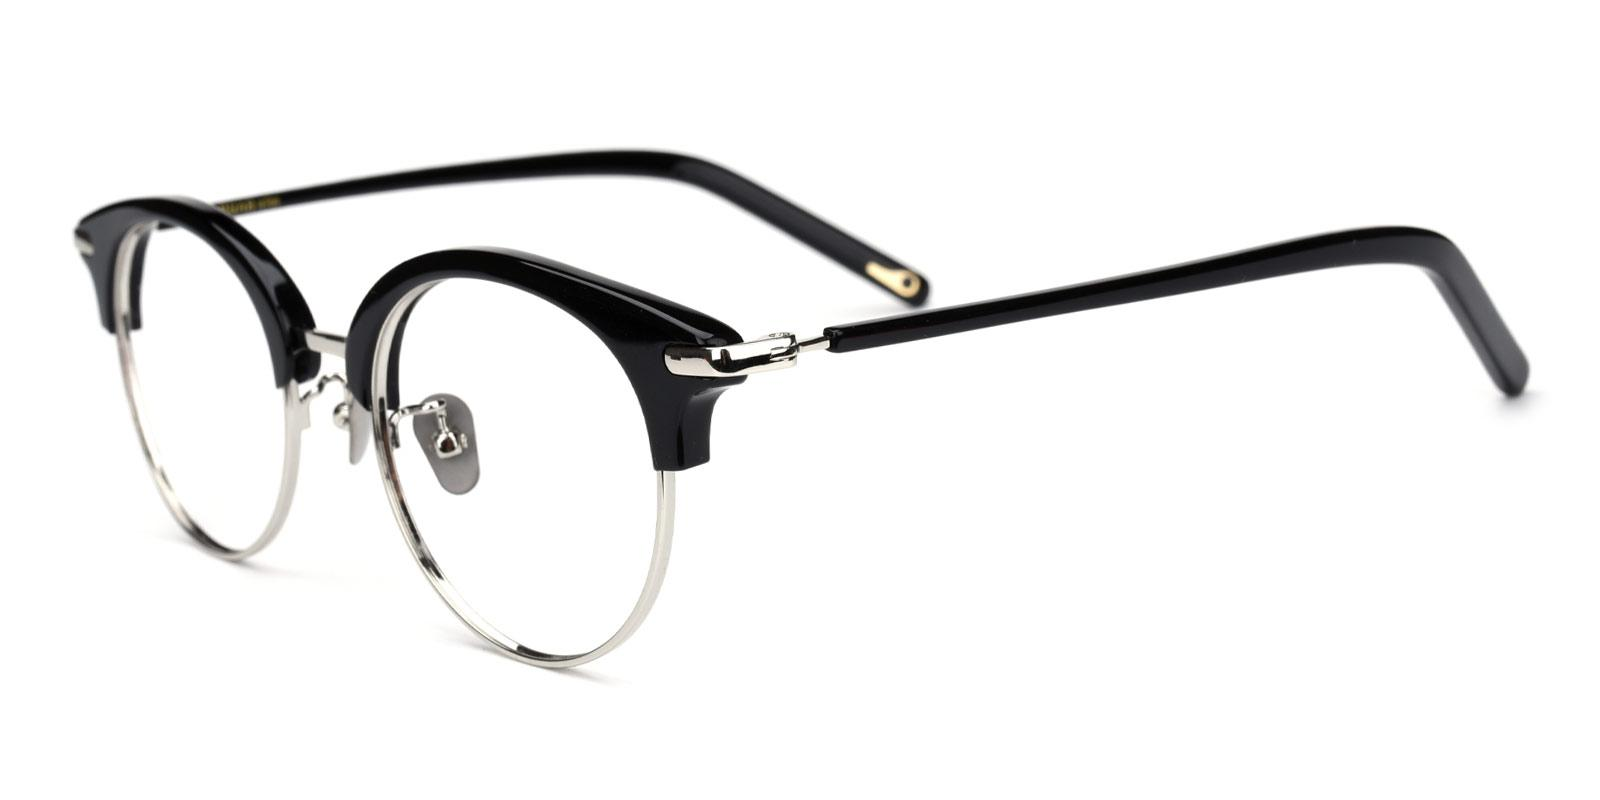 Jodie-Black-Browline-Titanium-Eyeglasses-additional1